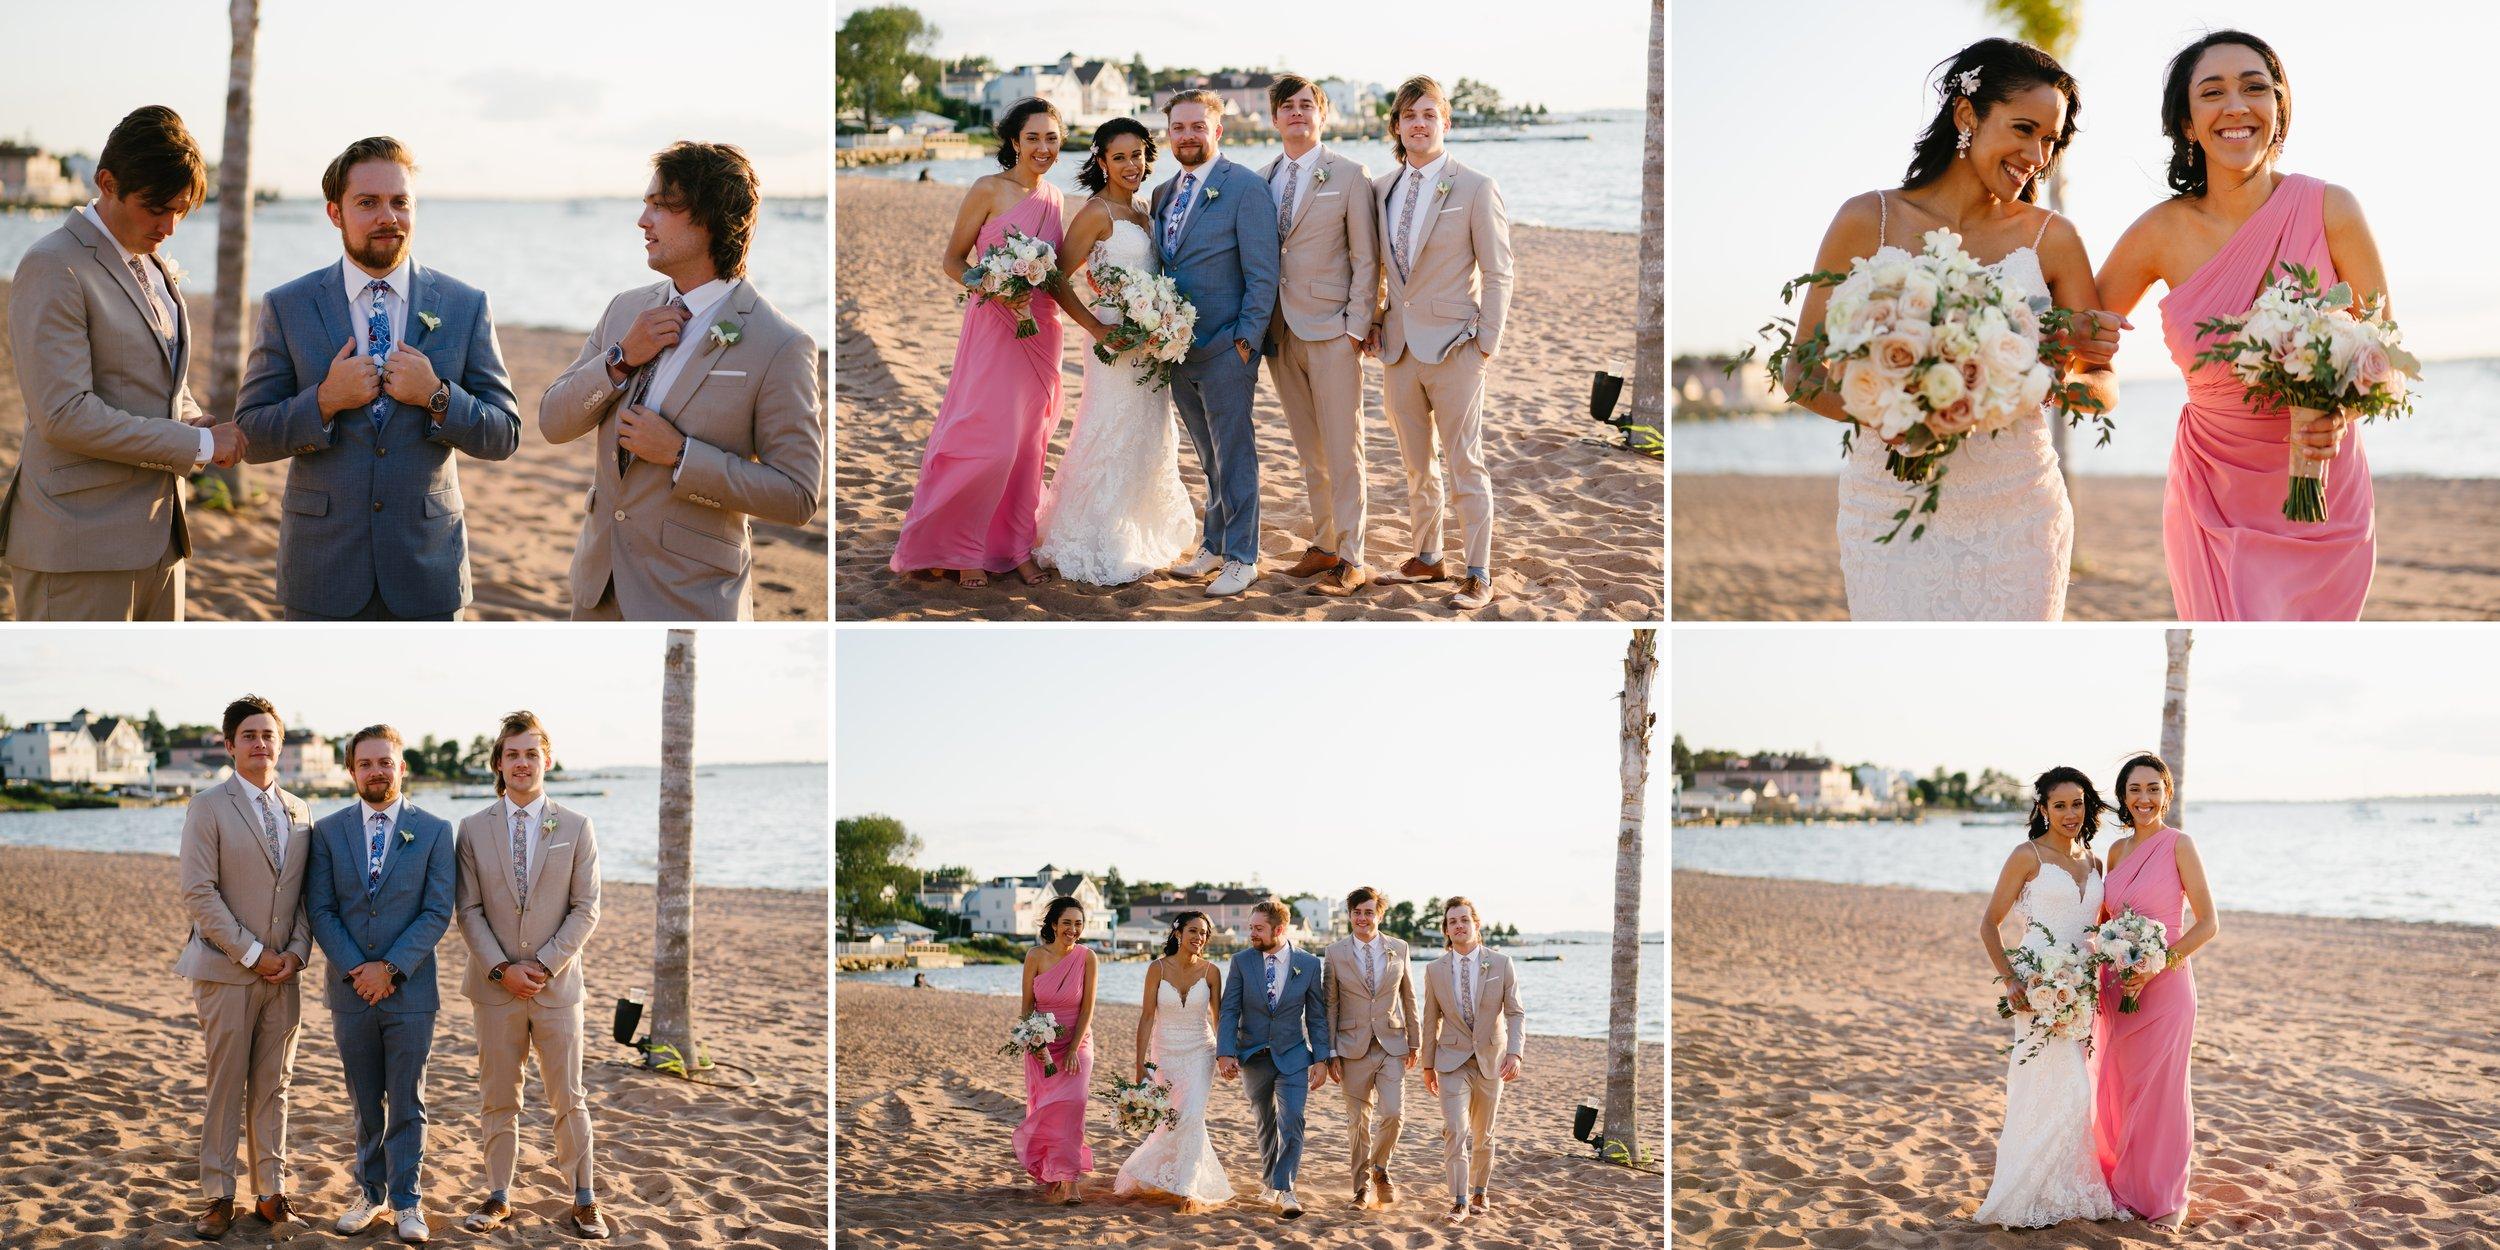 beach wedding | los angeles wedding photographer